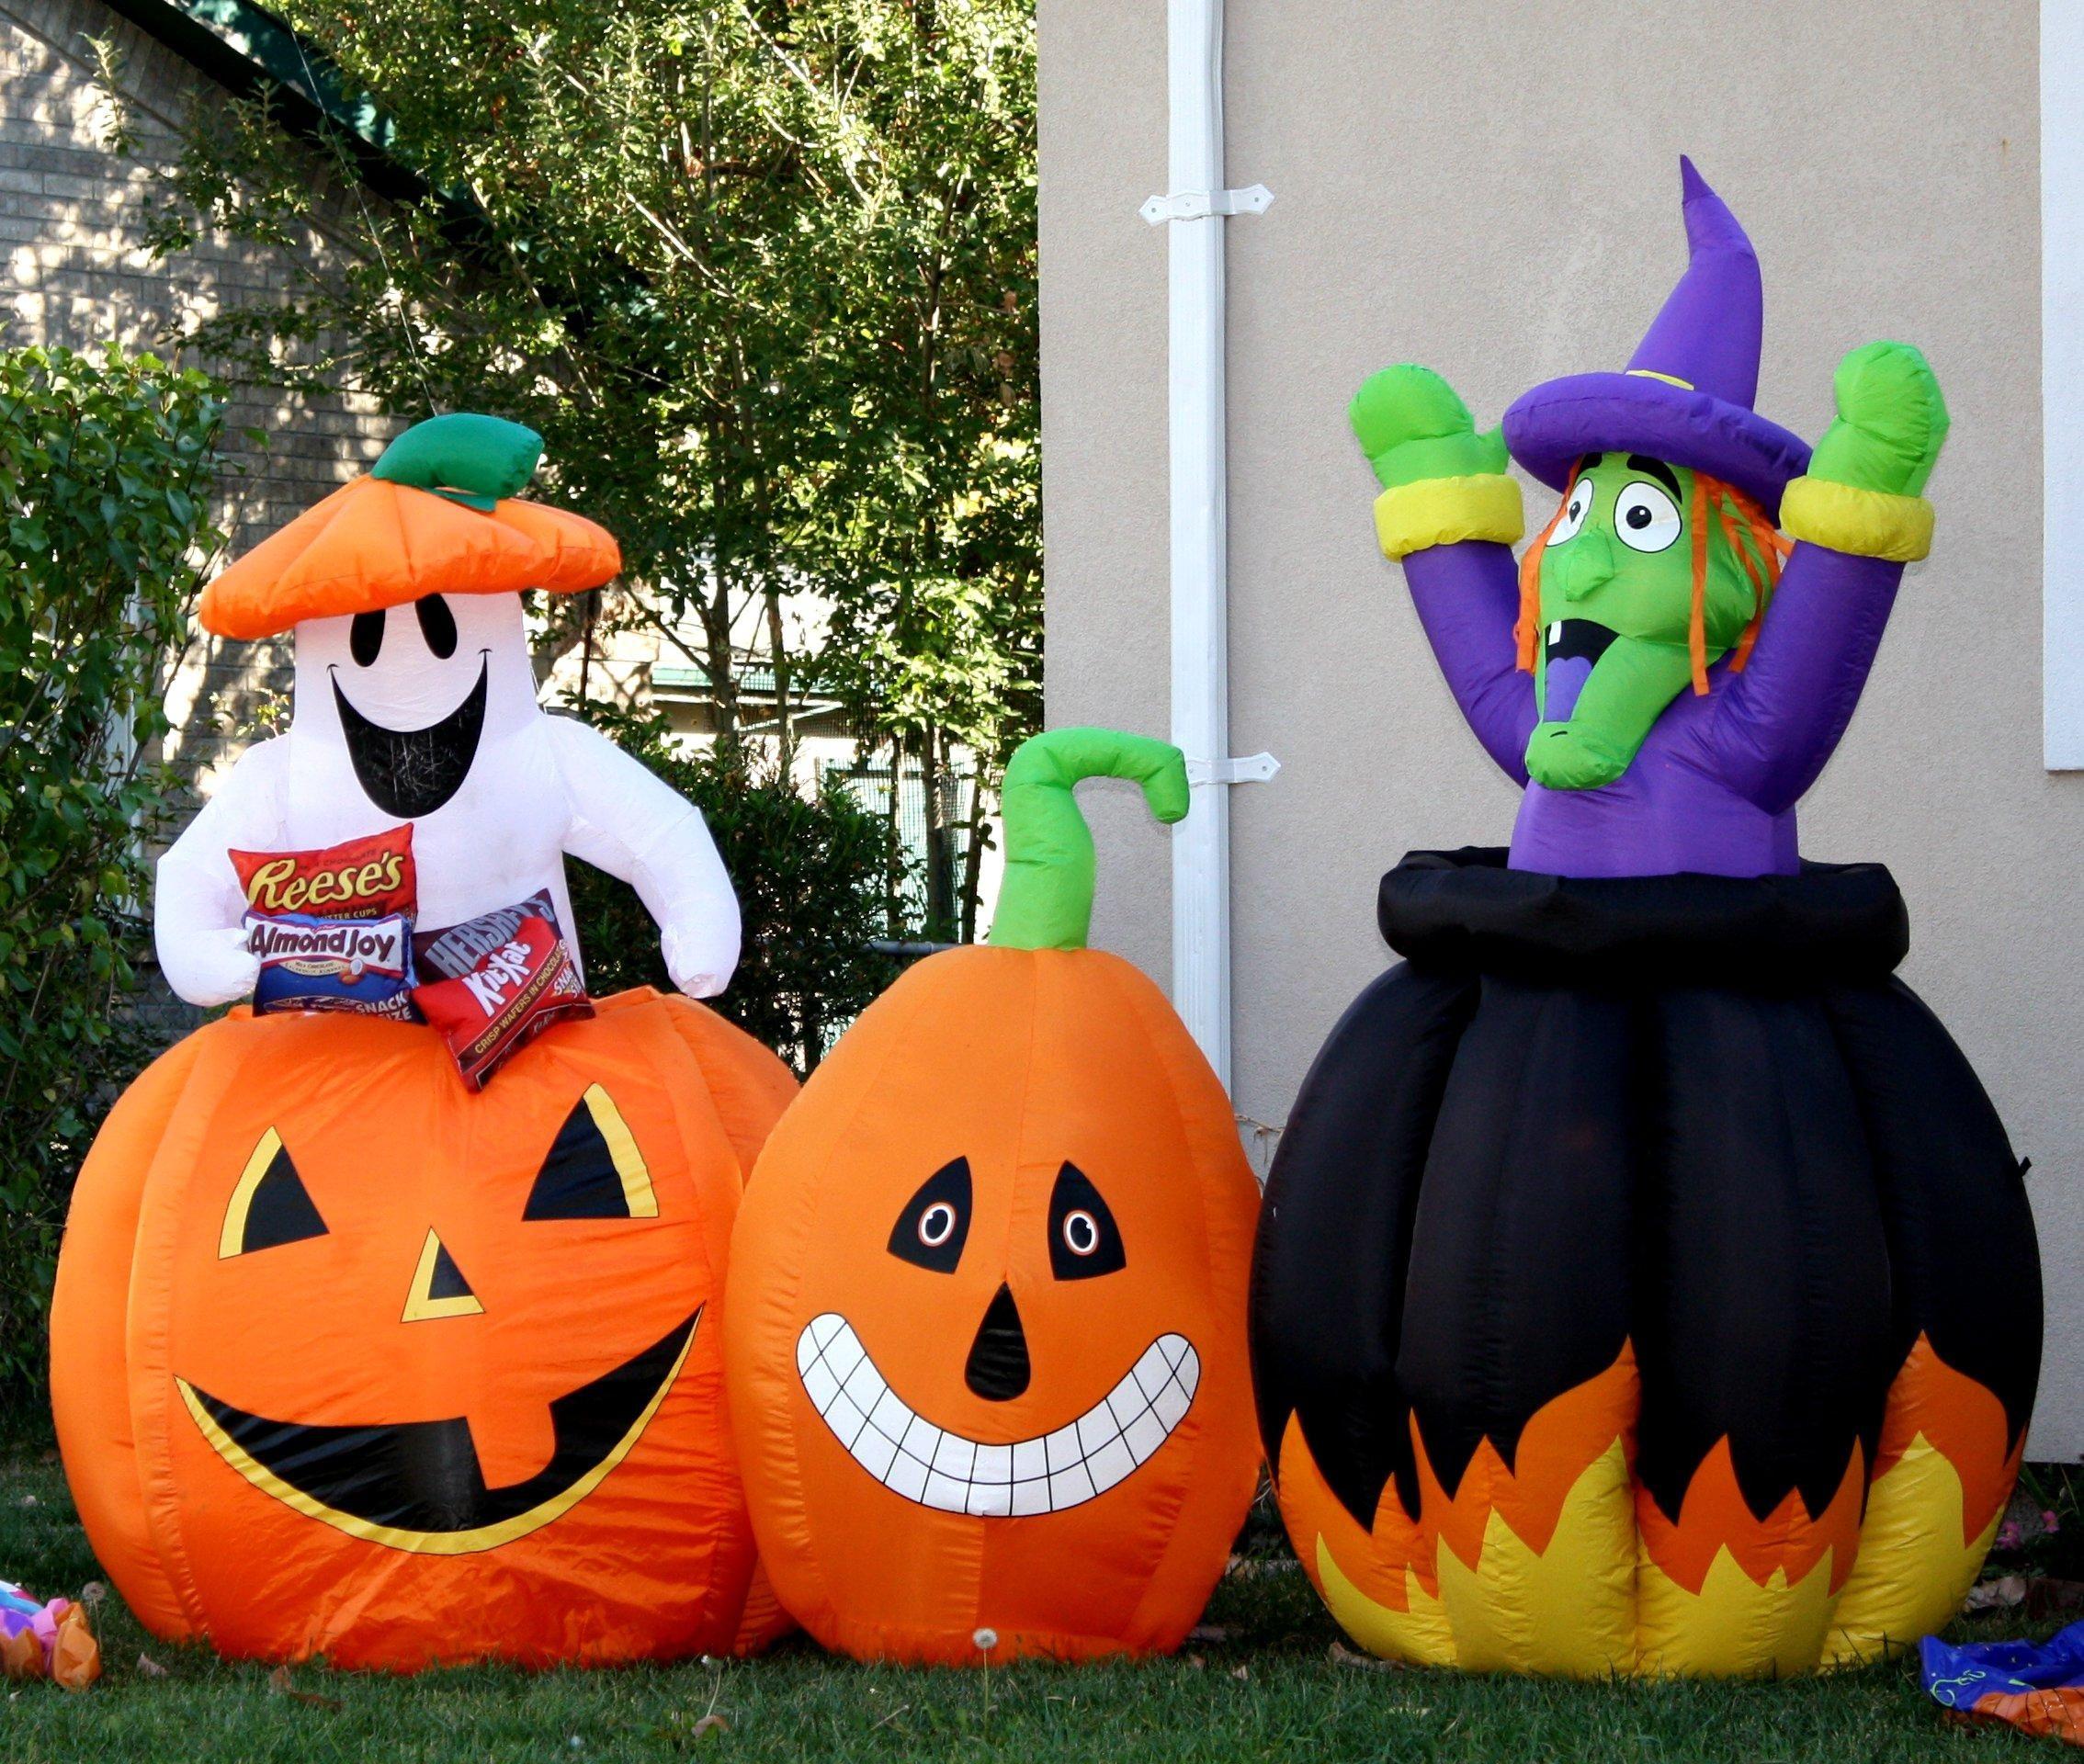 Lowes Halloween Decorations Clearance Sale 50 Off Halloween Yard Decorations Halloween Decorations Halloween Pumpkin Designs